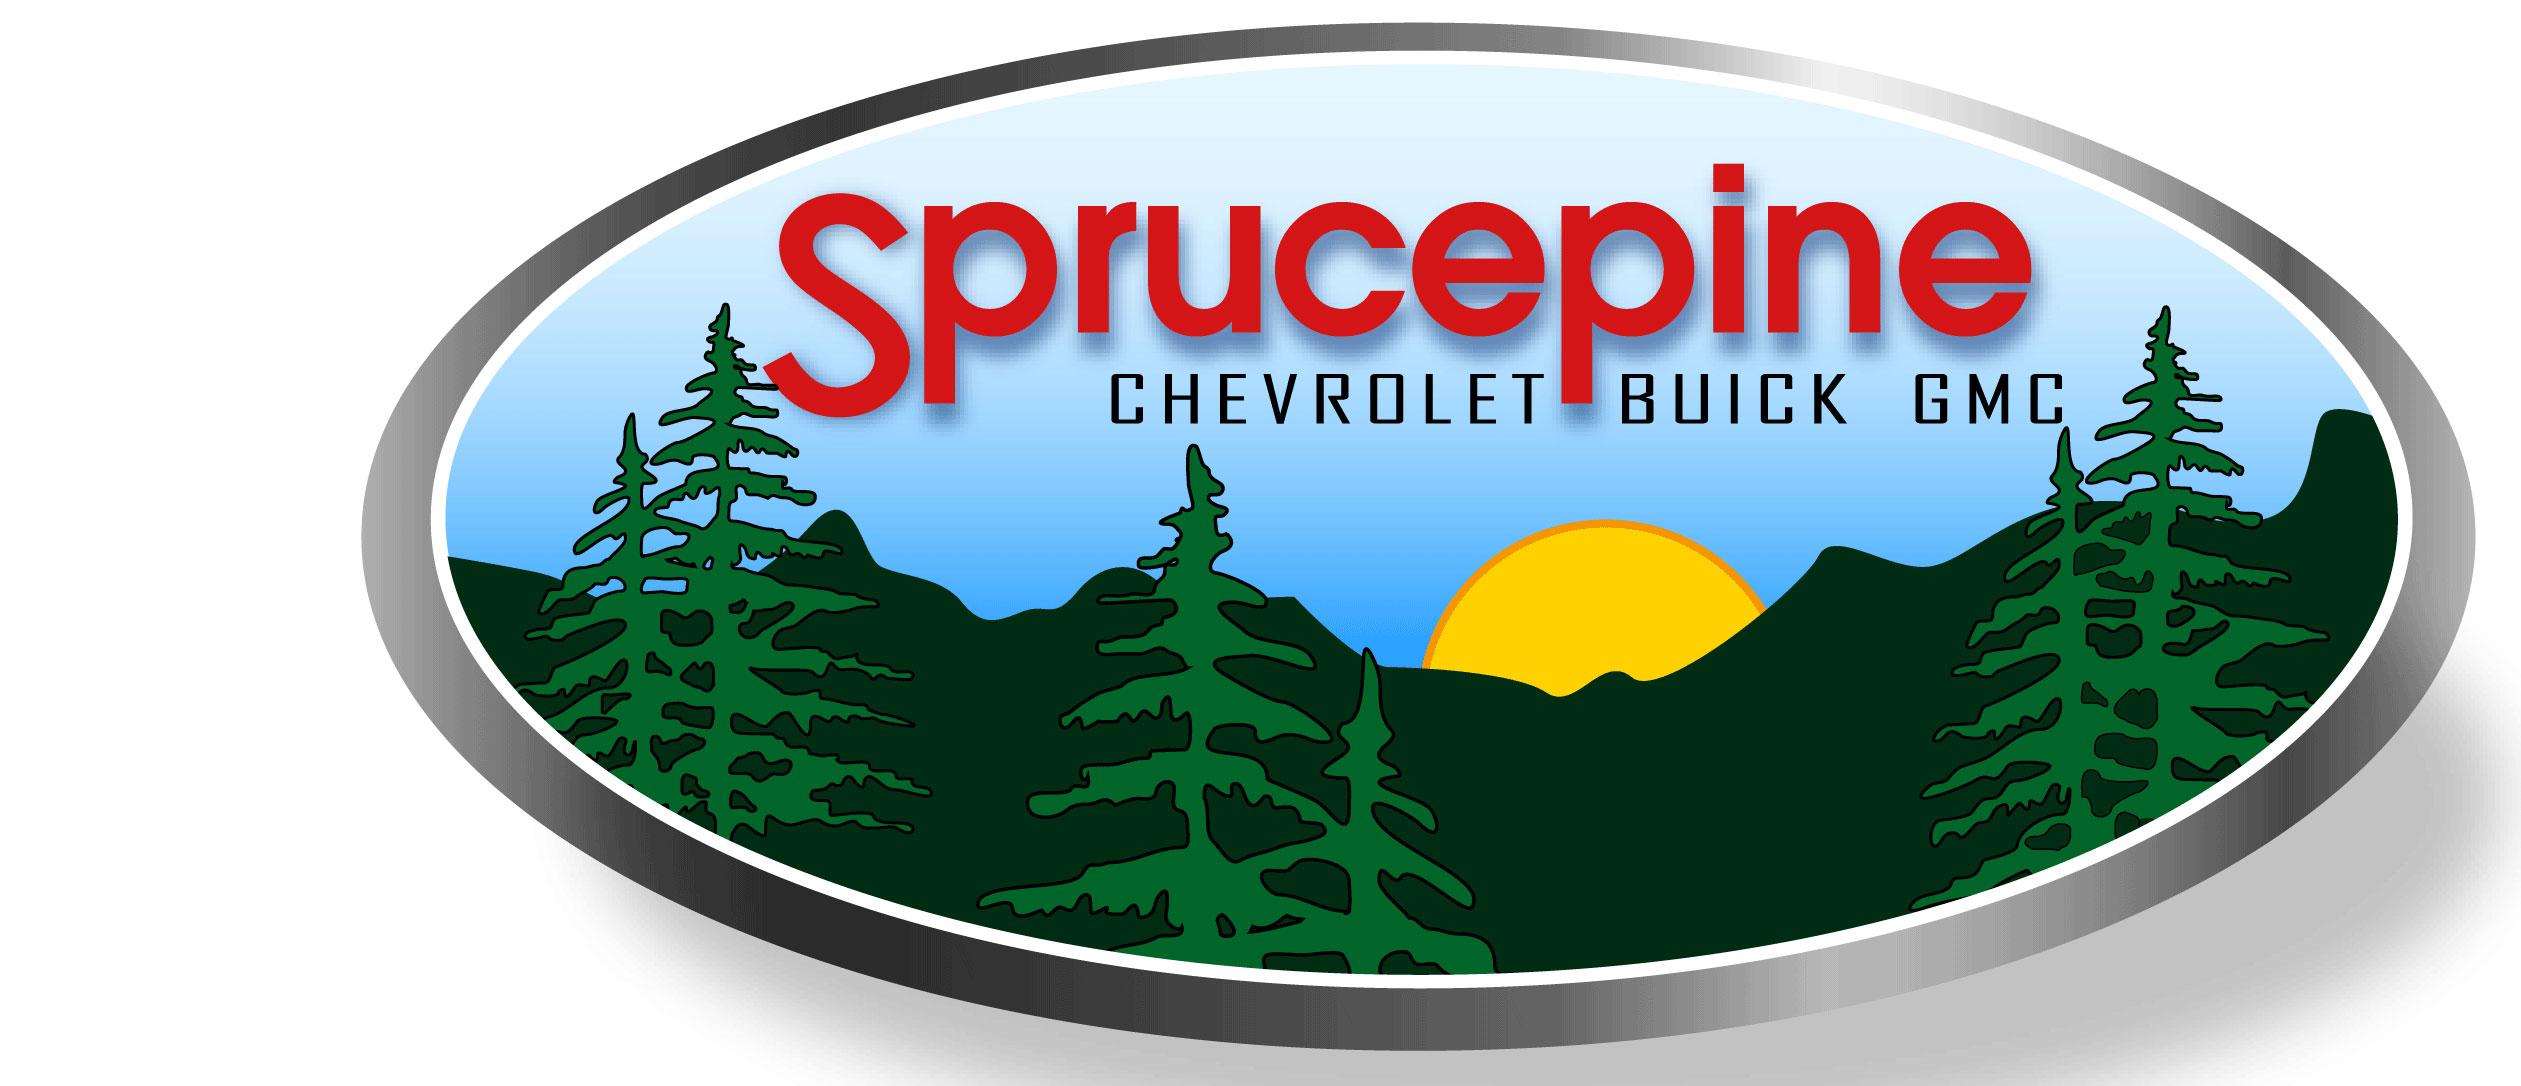 Spruce Pine Chevrolet Buick GMC